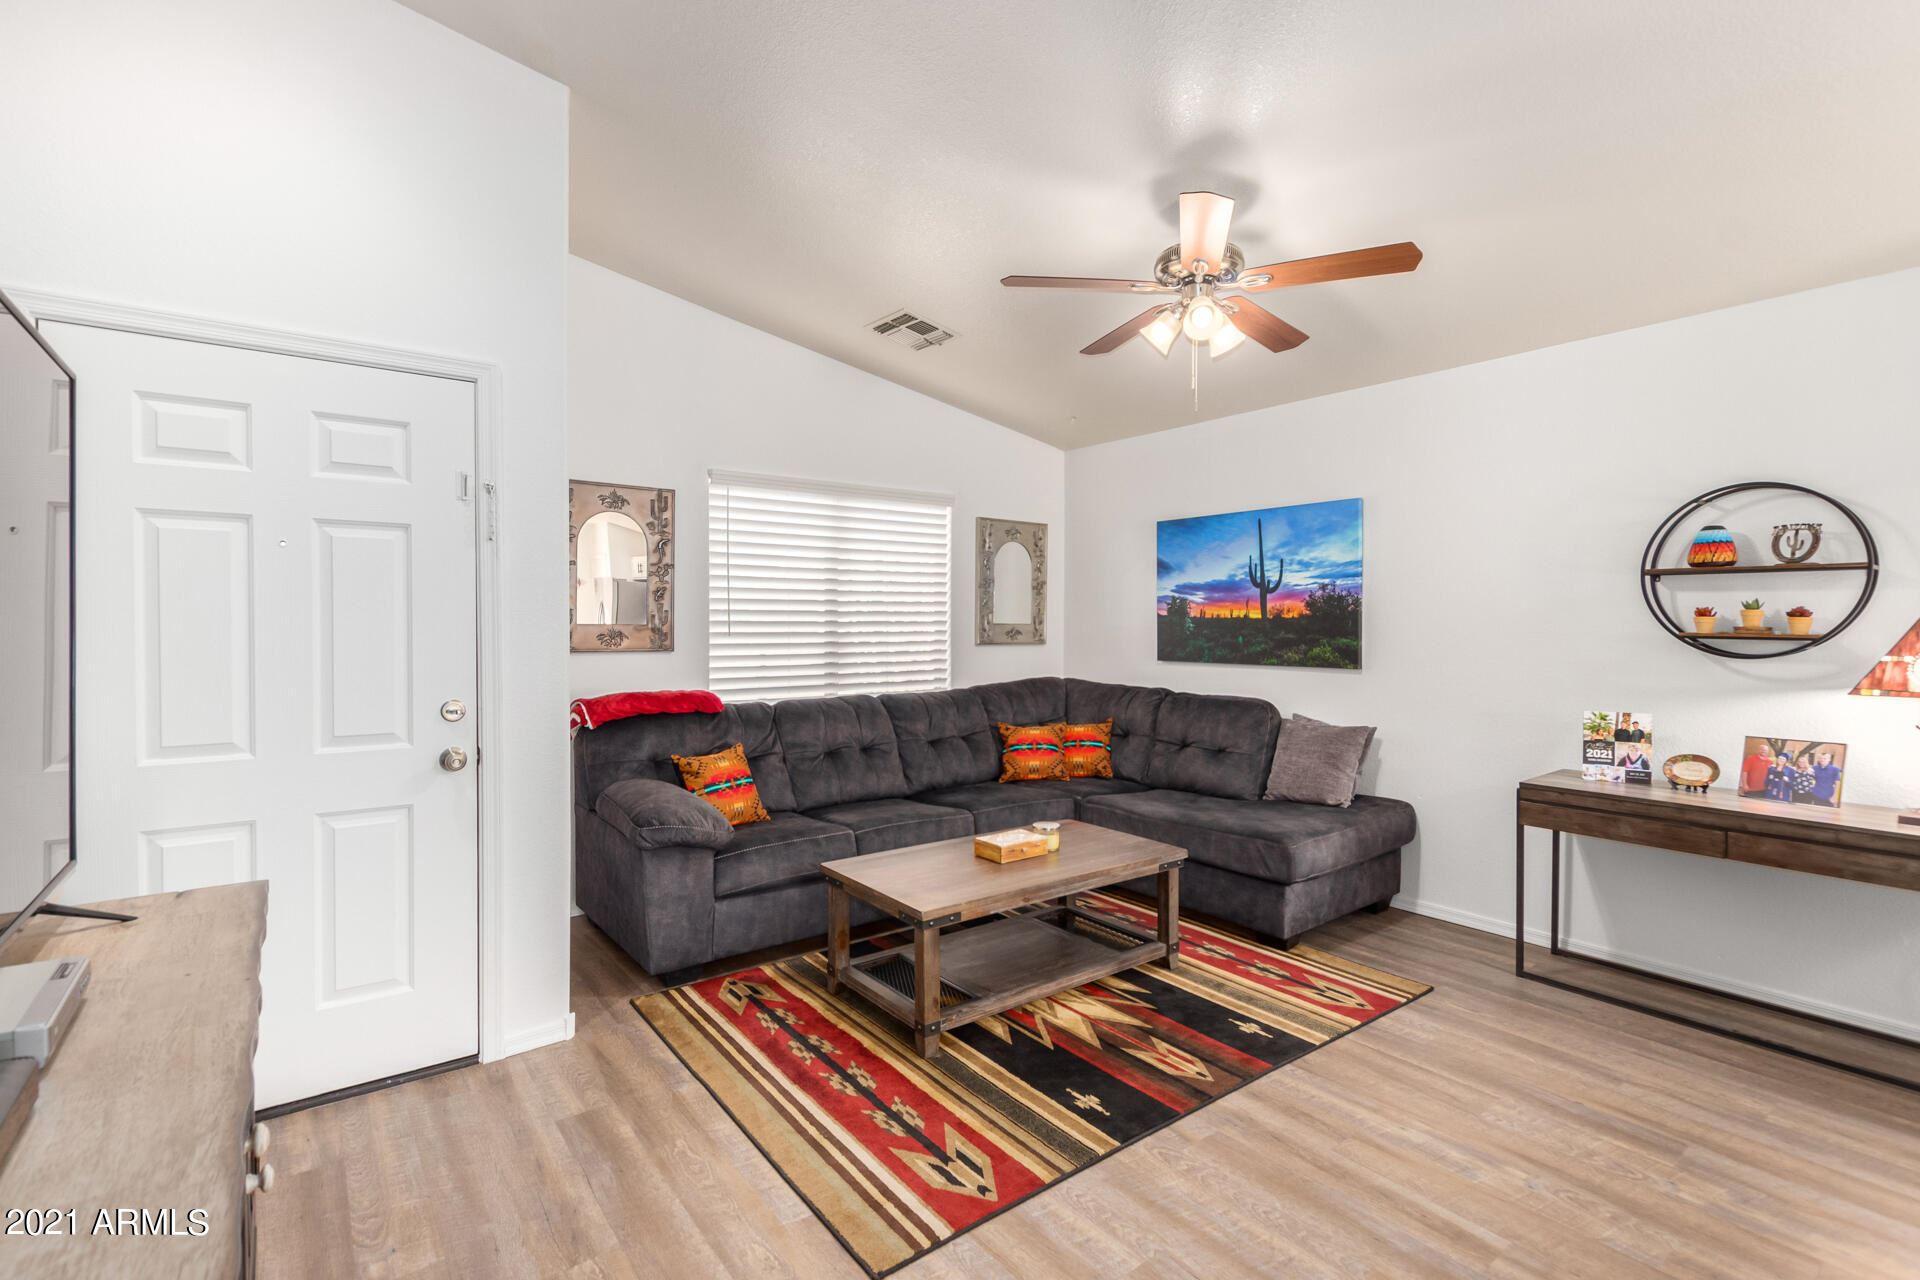 Photo of 1267 W DIAMOND Avenue, Apache Junction, AZ 85120 (MLS # 6307005)